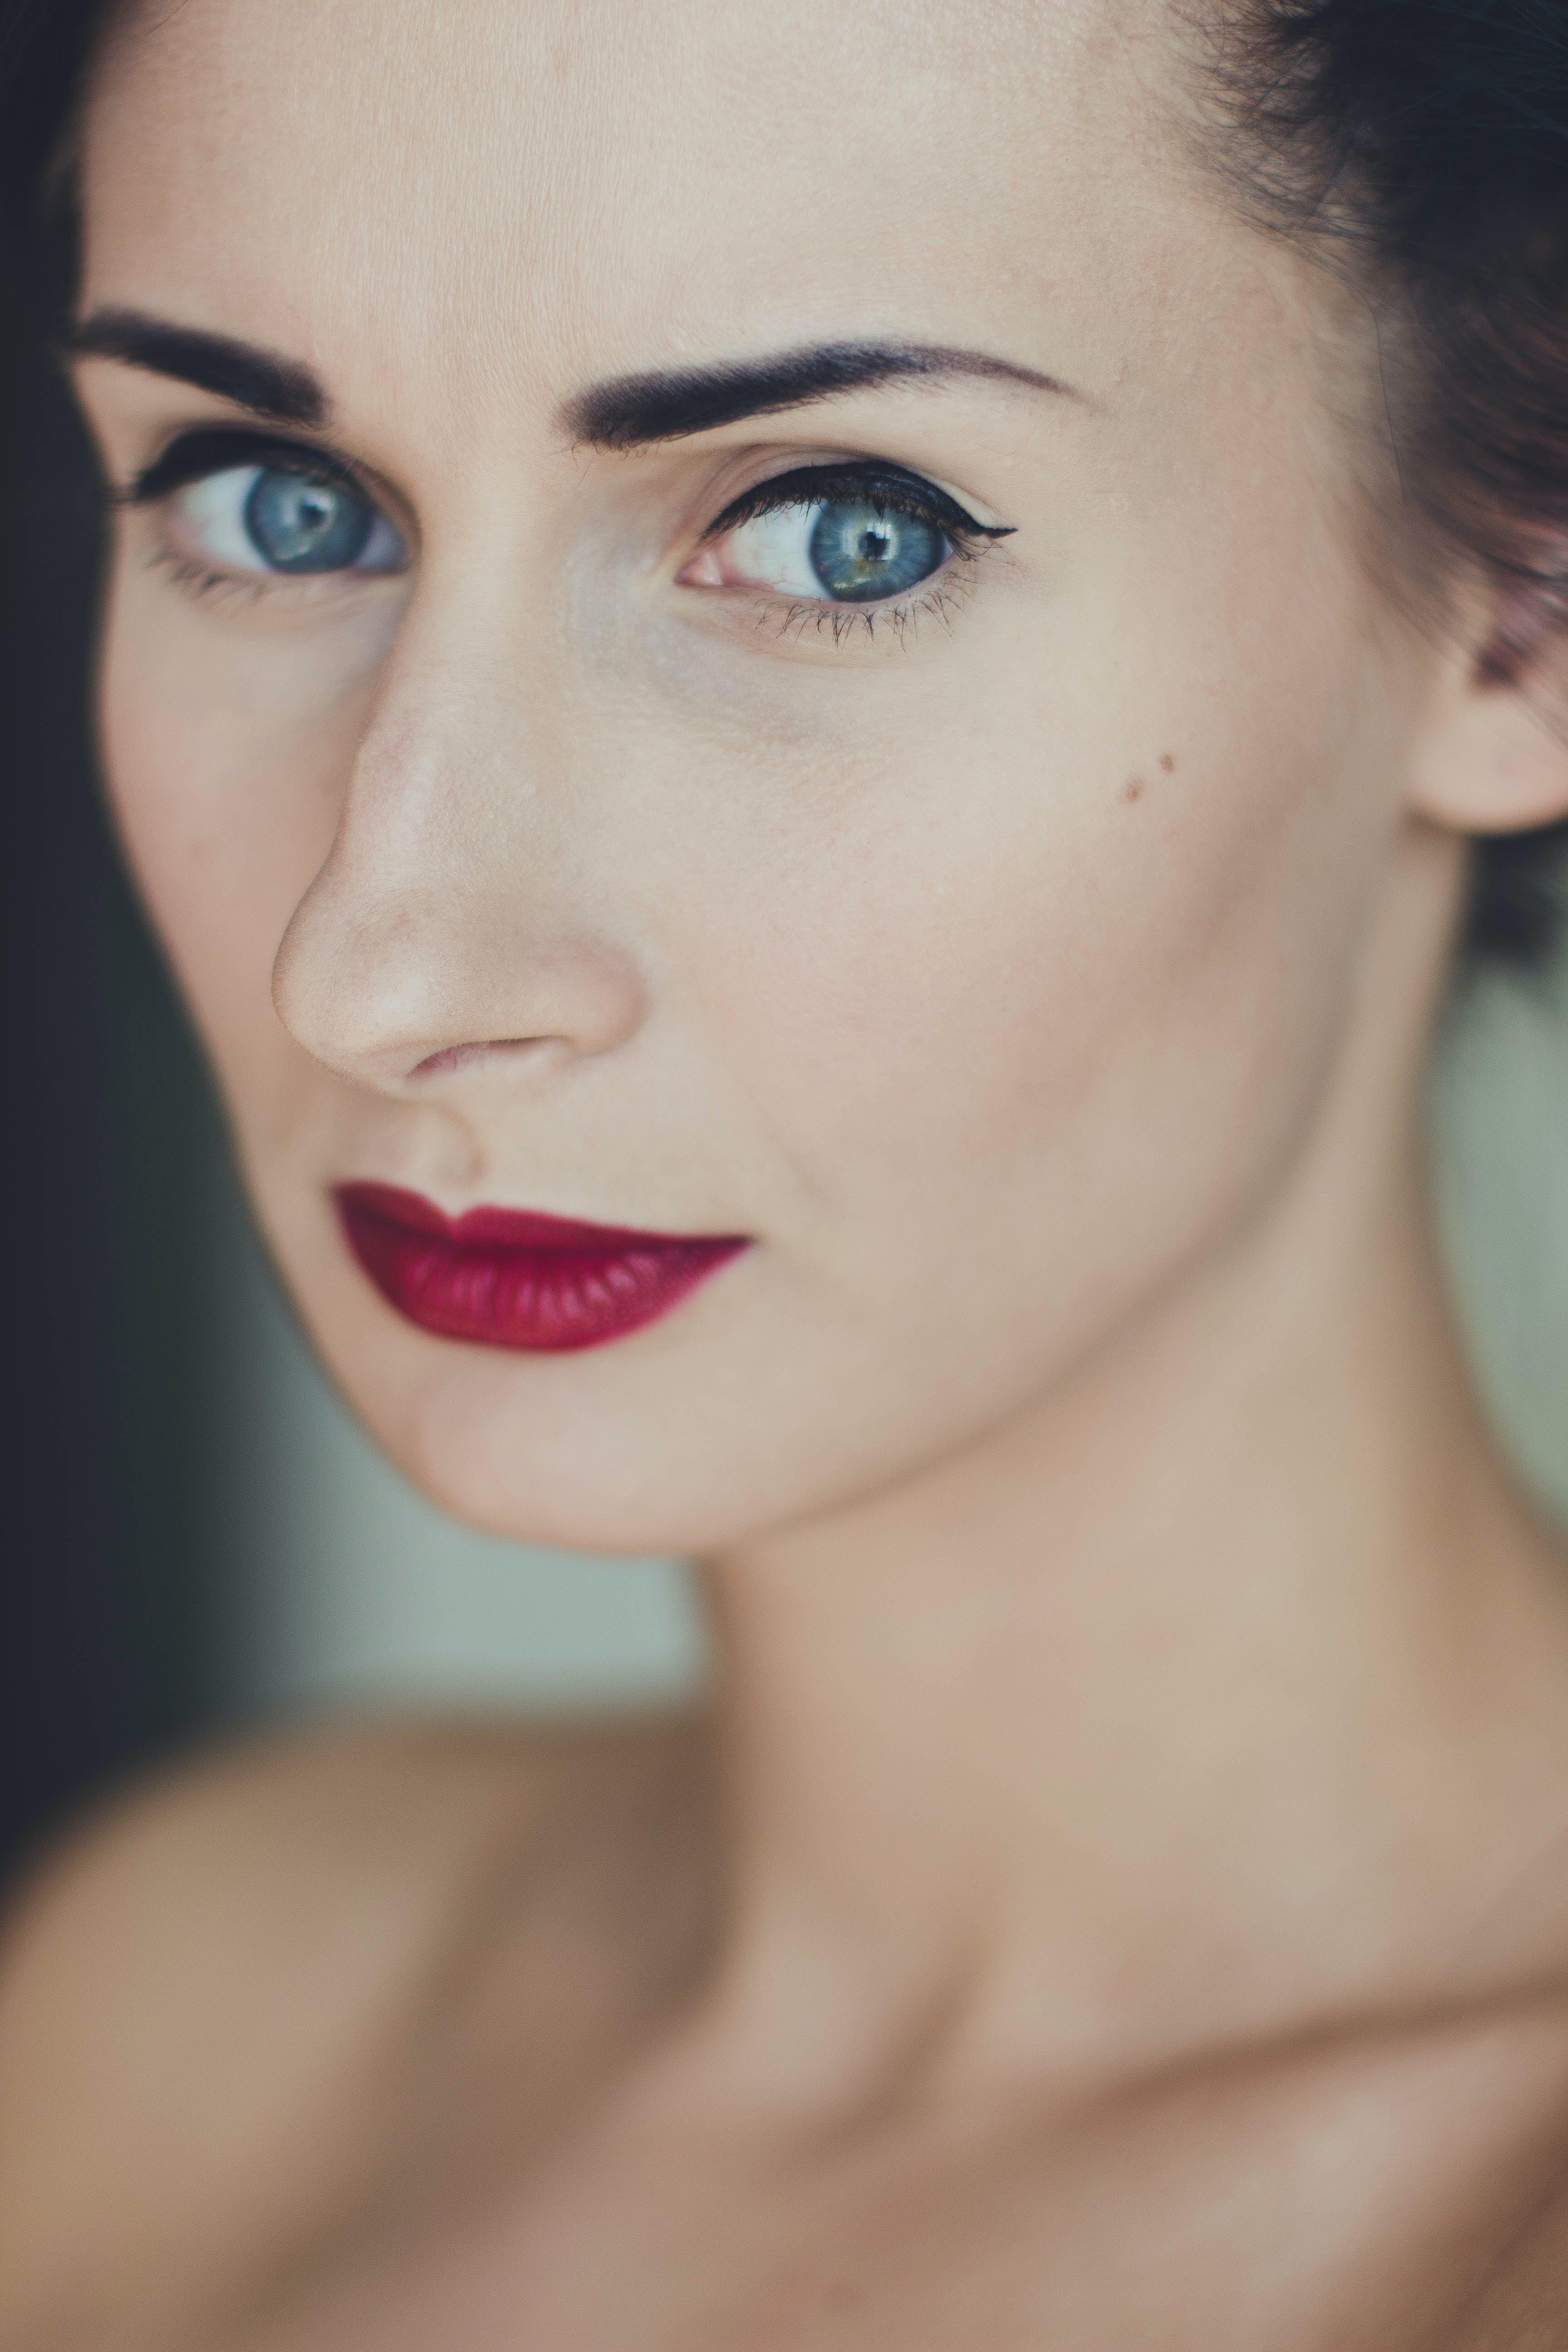 Woman Wearing Black Mascara and Red Lipstick